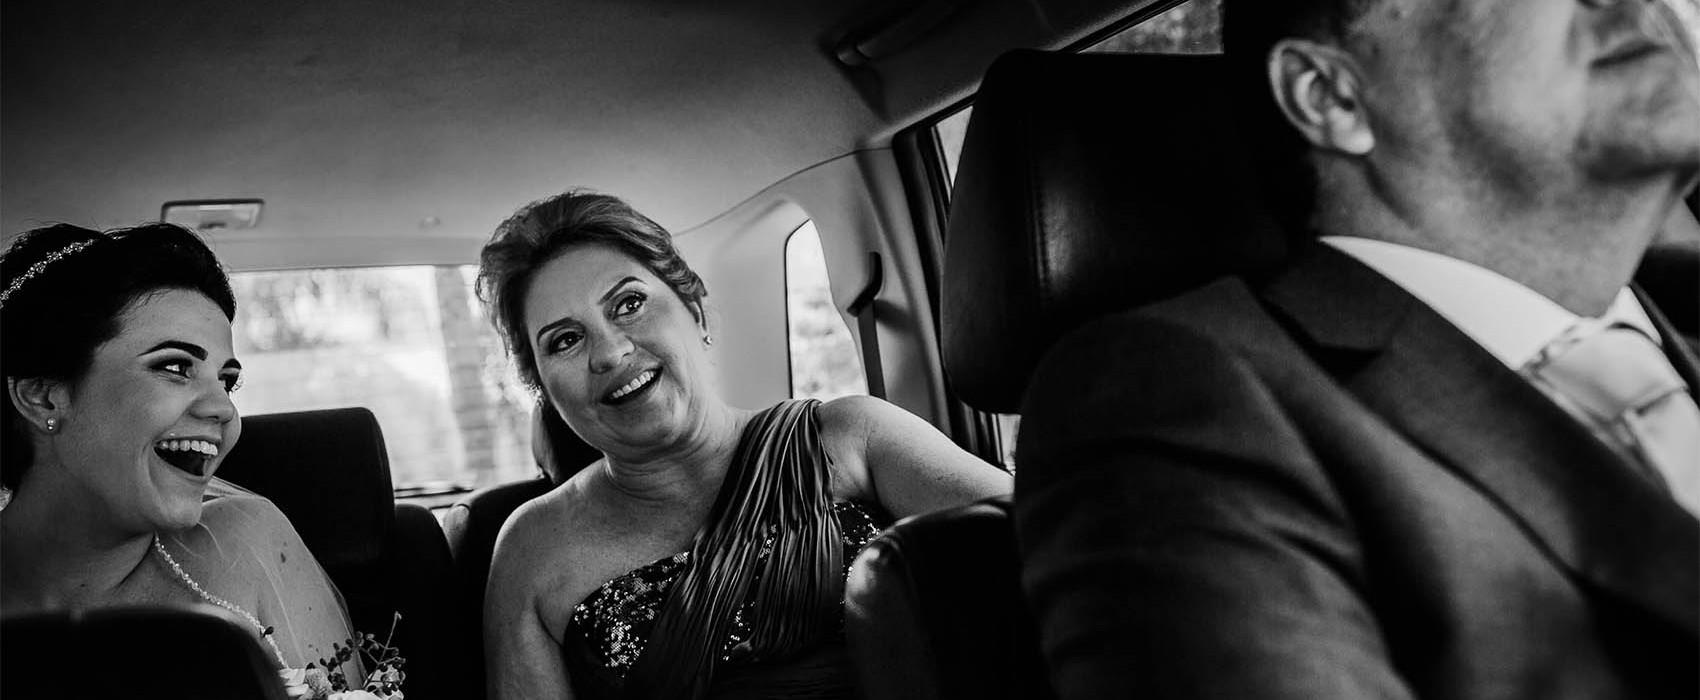 renato dpaula foto de casamento noiva feliz no carro